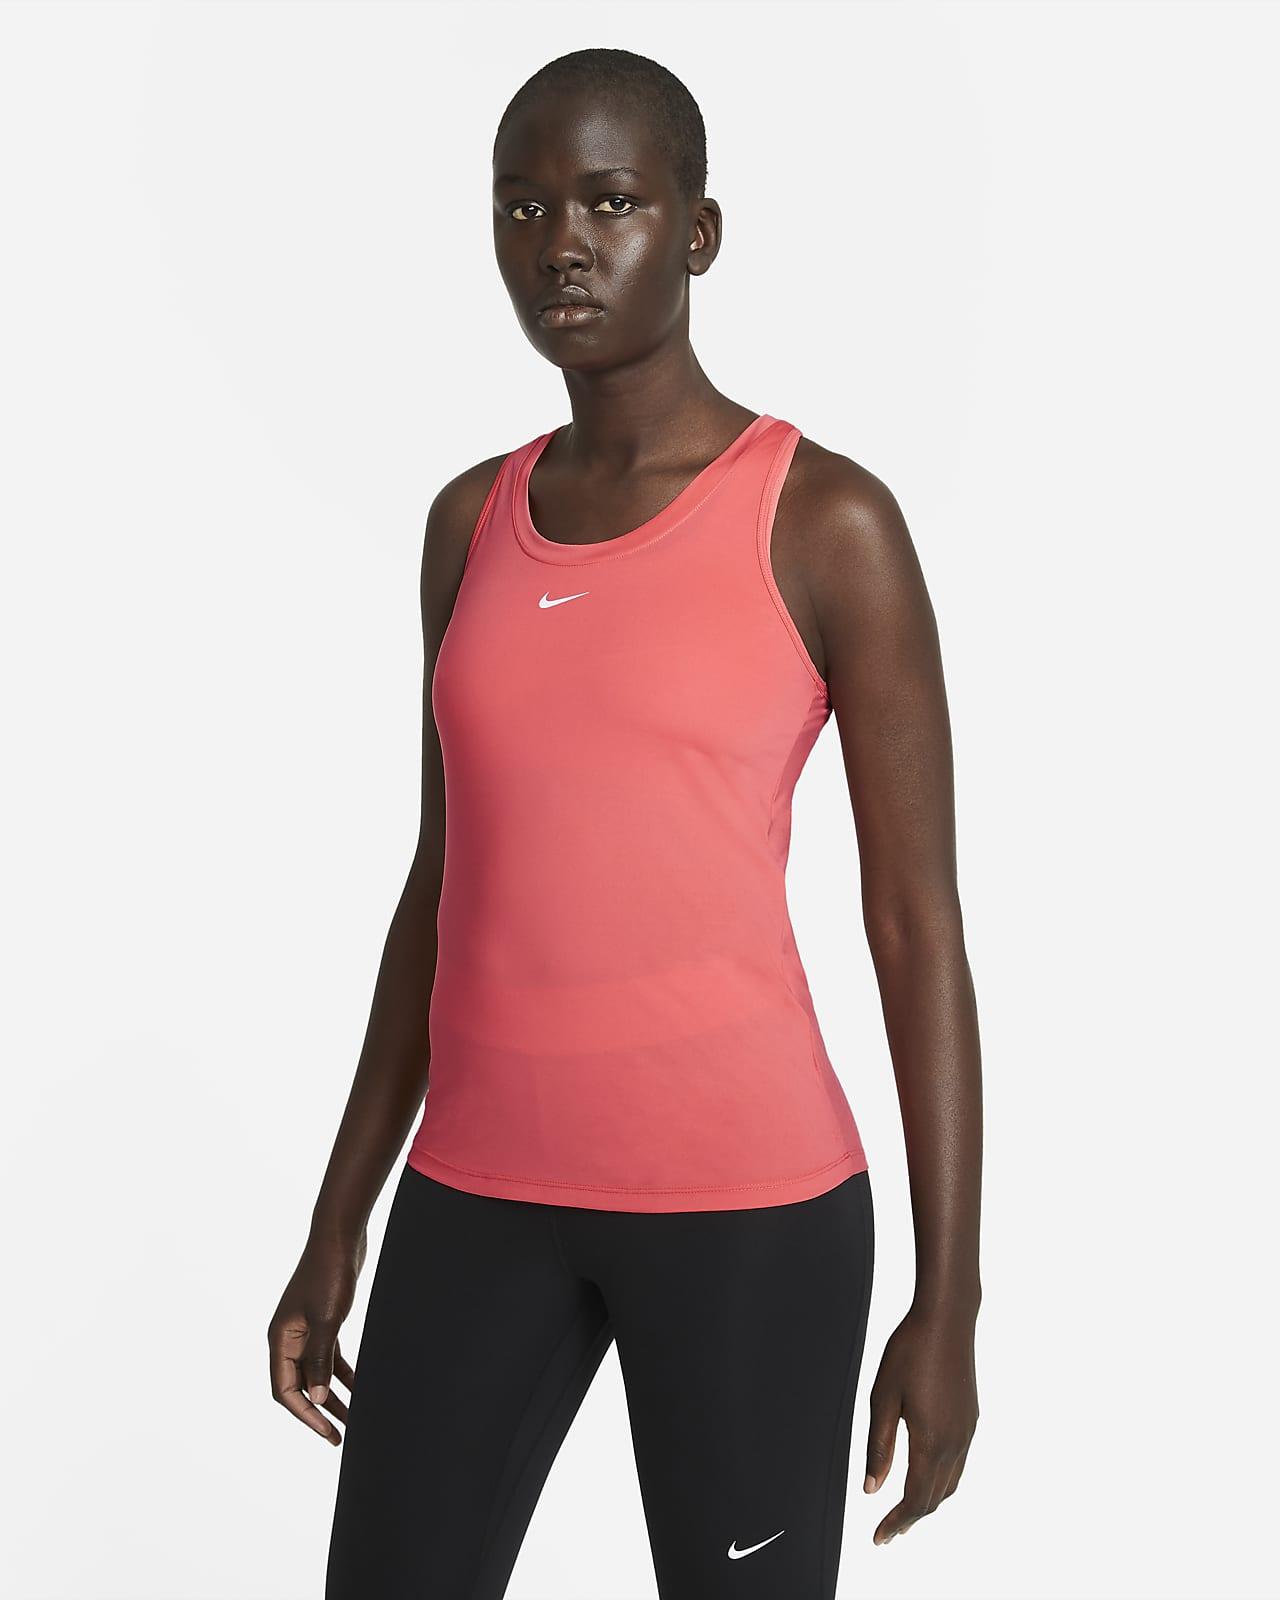 Camiseta de tirantes de ajuste slim para mujer Nike Dri-FIT One